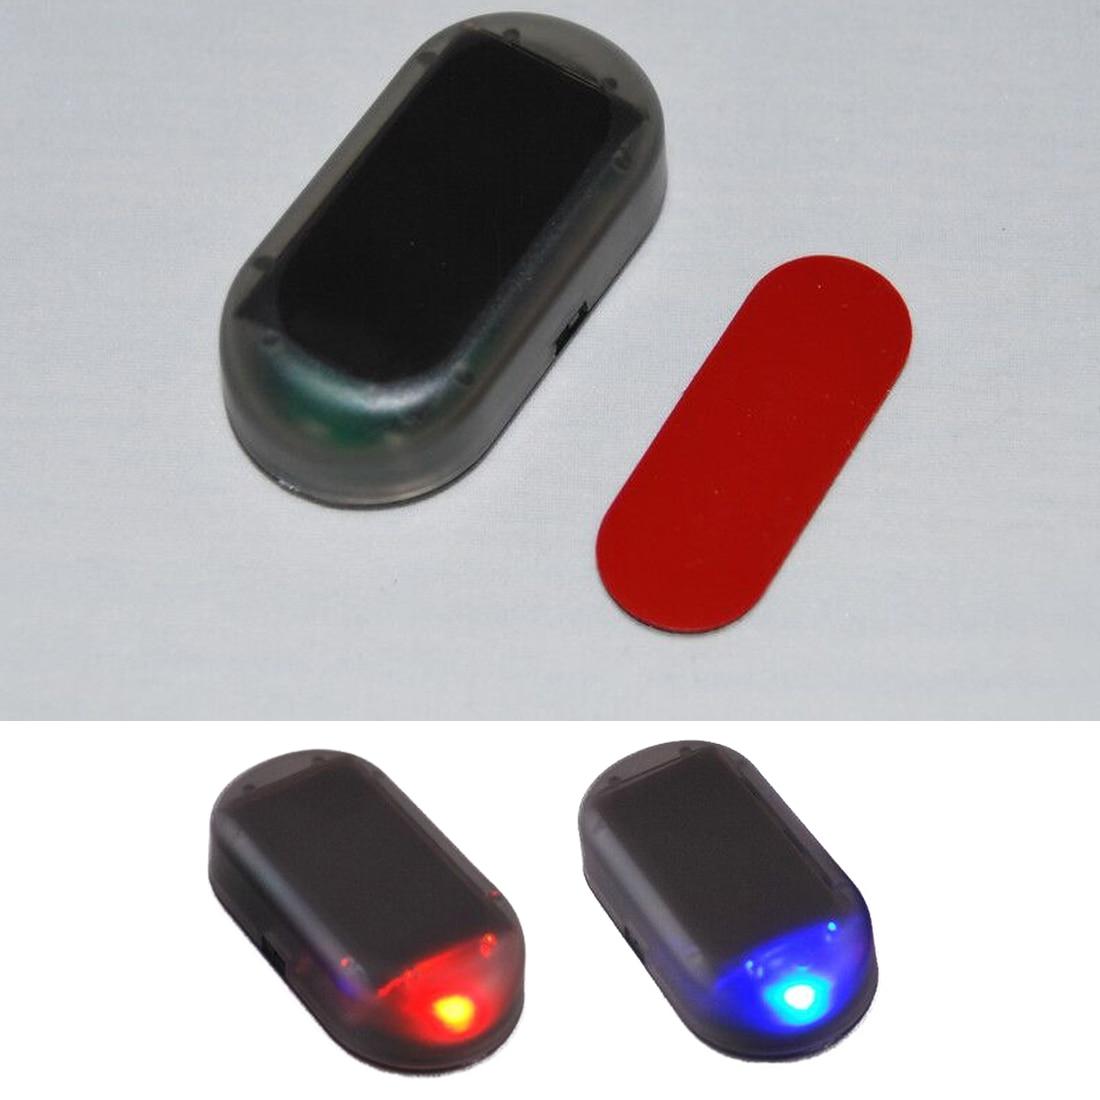 Warning Theft Security System Flash Blinking Fake Solar Car Alarm LED Light 1PCS Universal Car Led Light